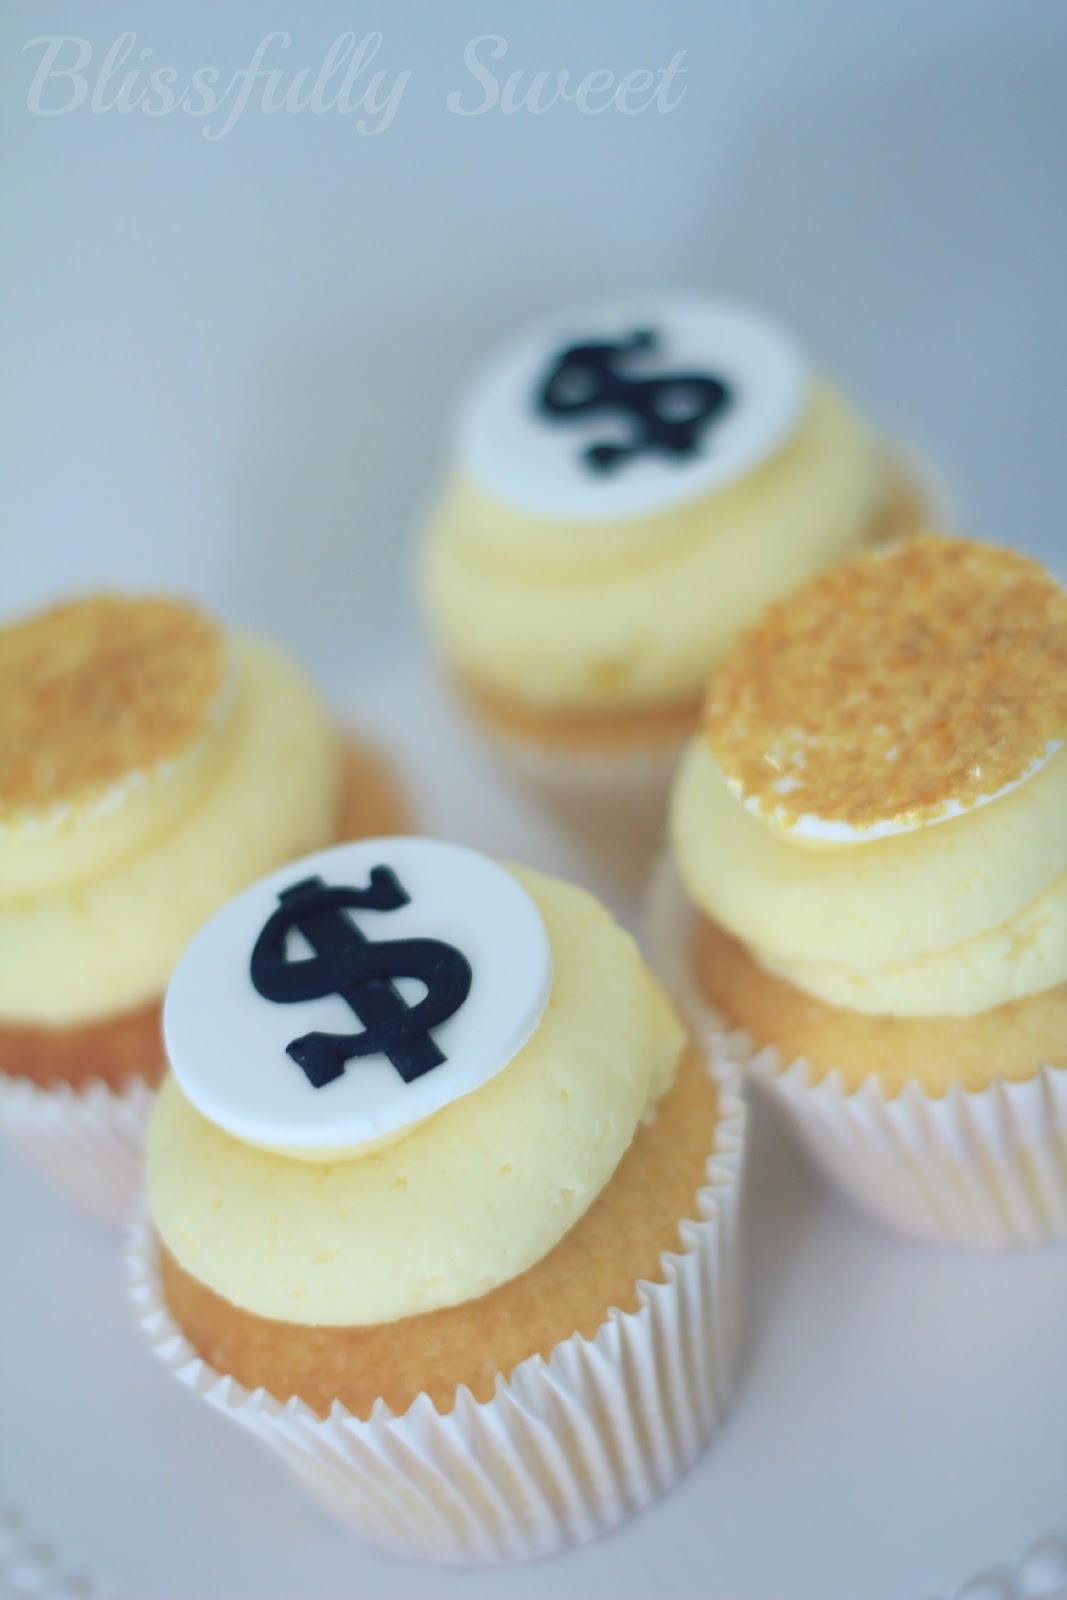 Blissfully Sweet Money Money Money Themed Cakes Amp Treats